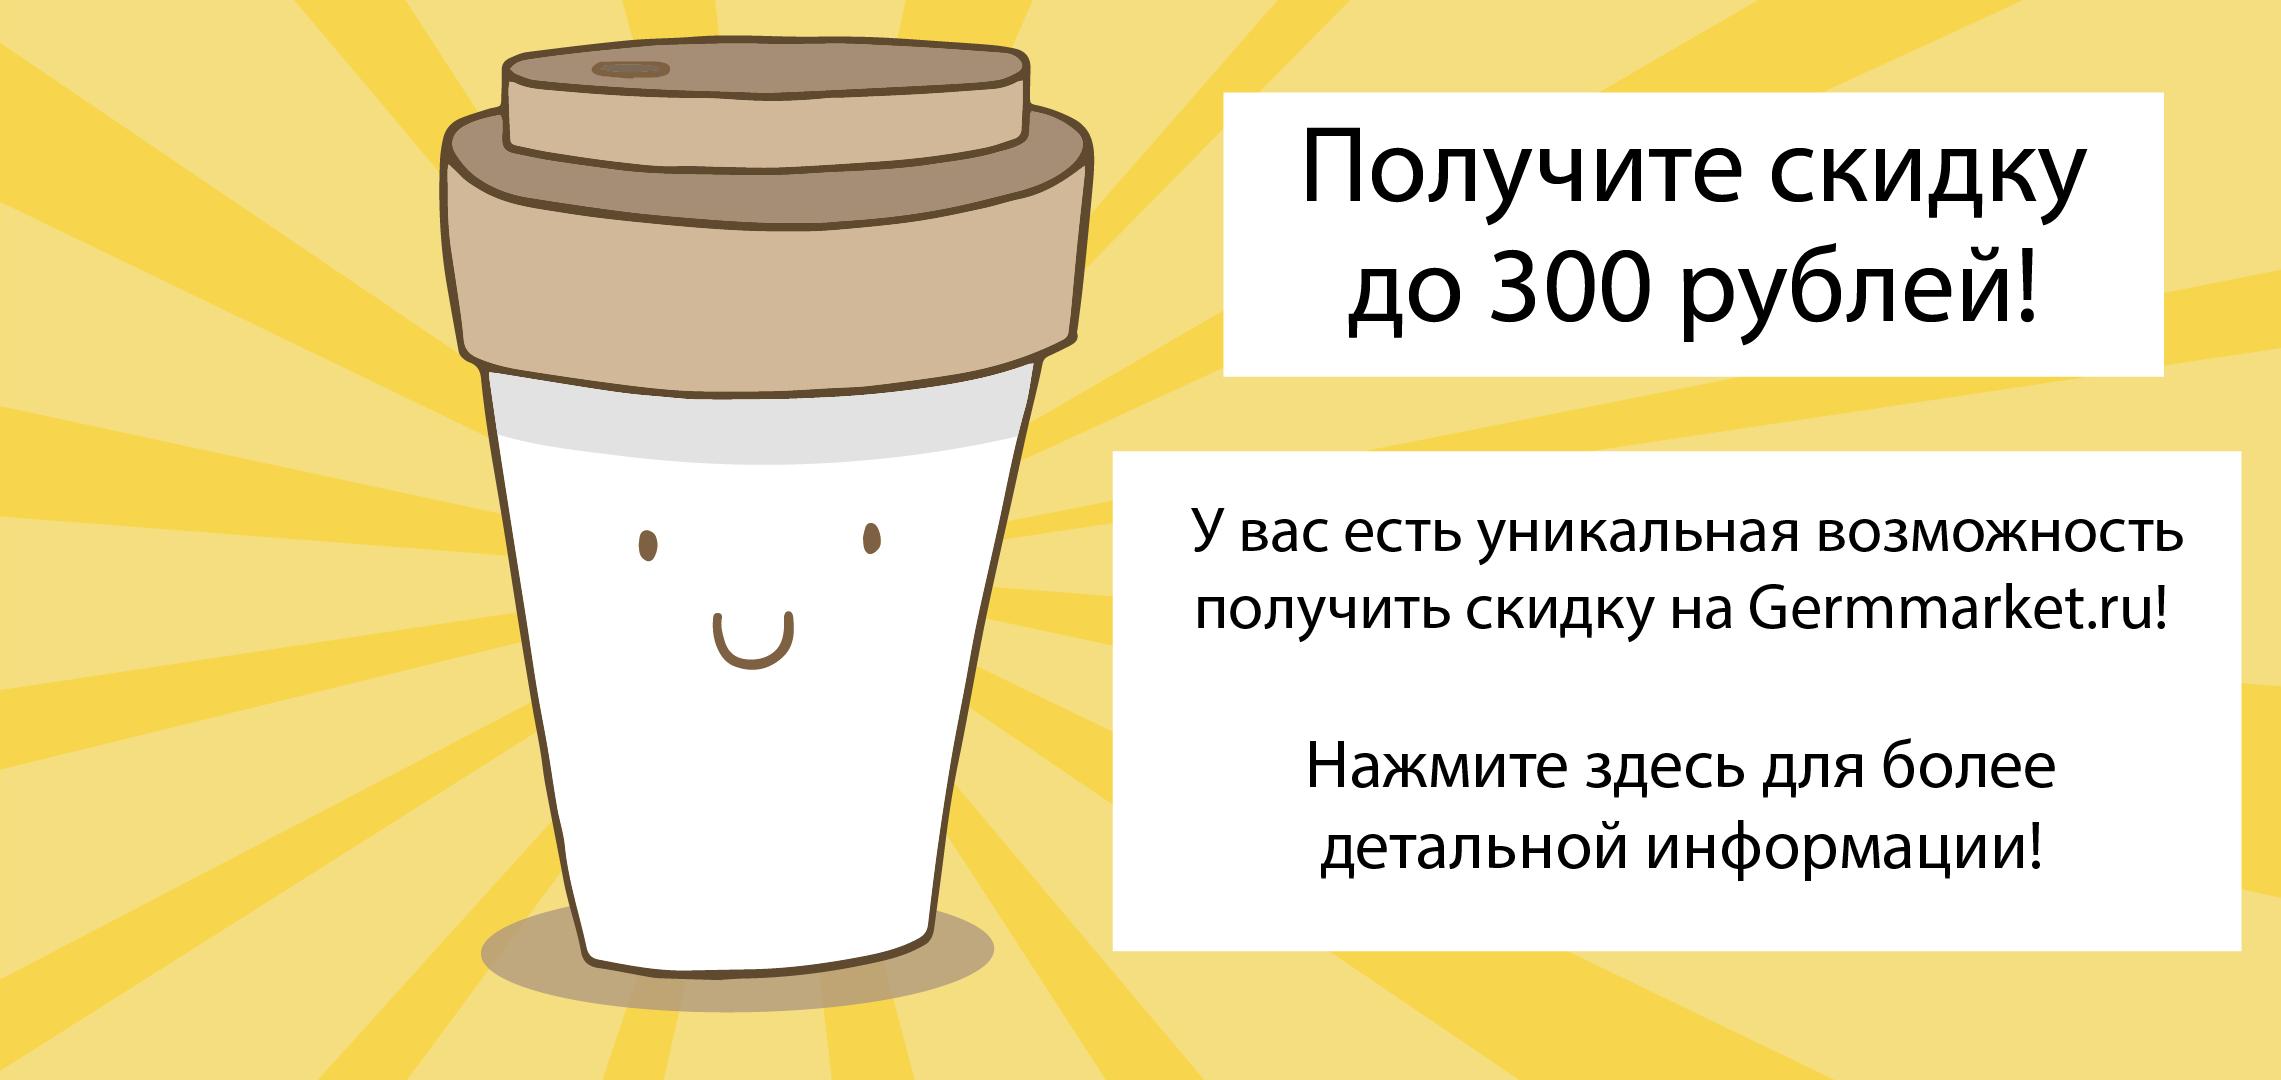 Скидки и бонусы Germmarket.ru